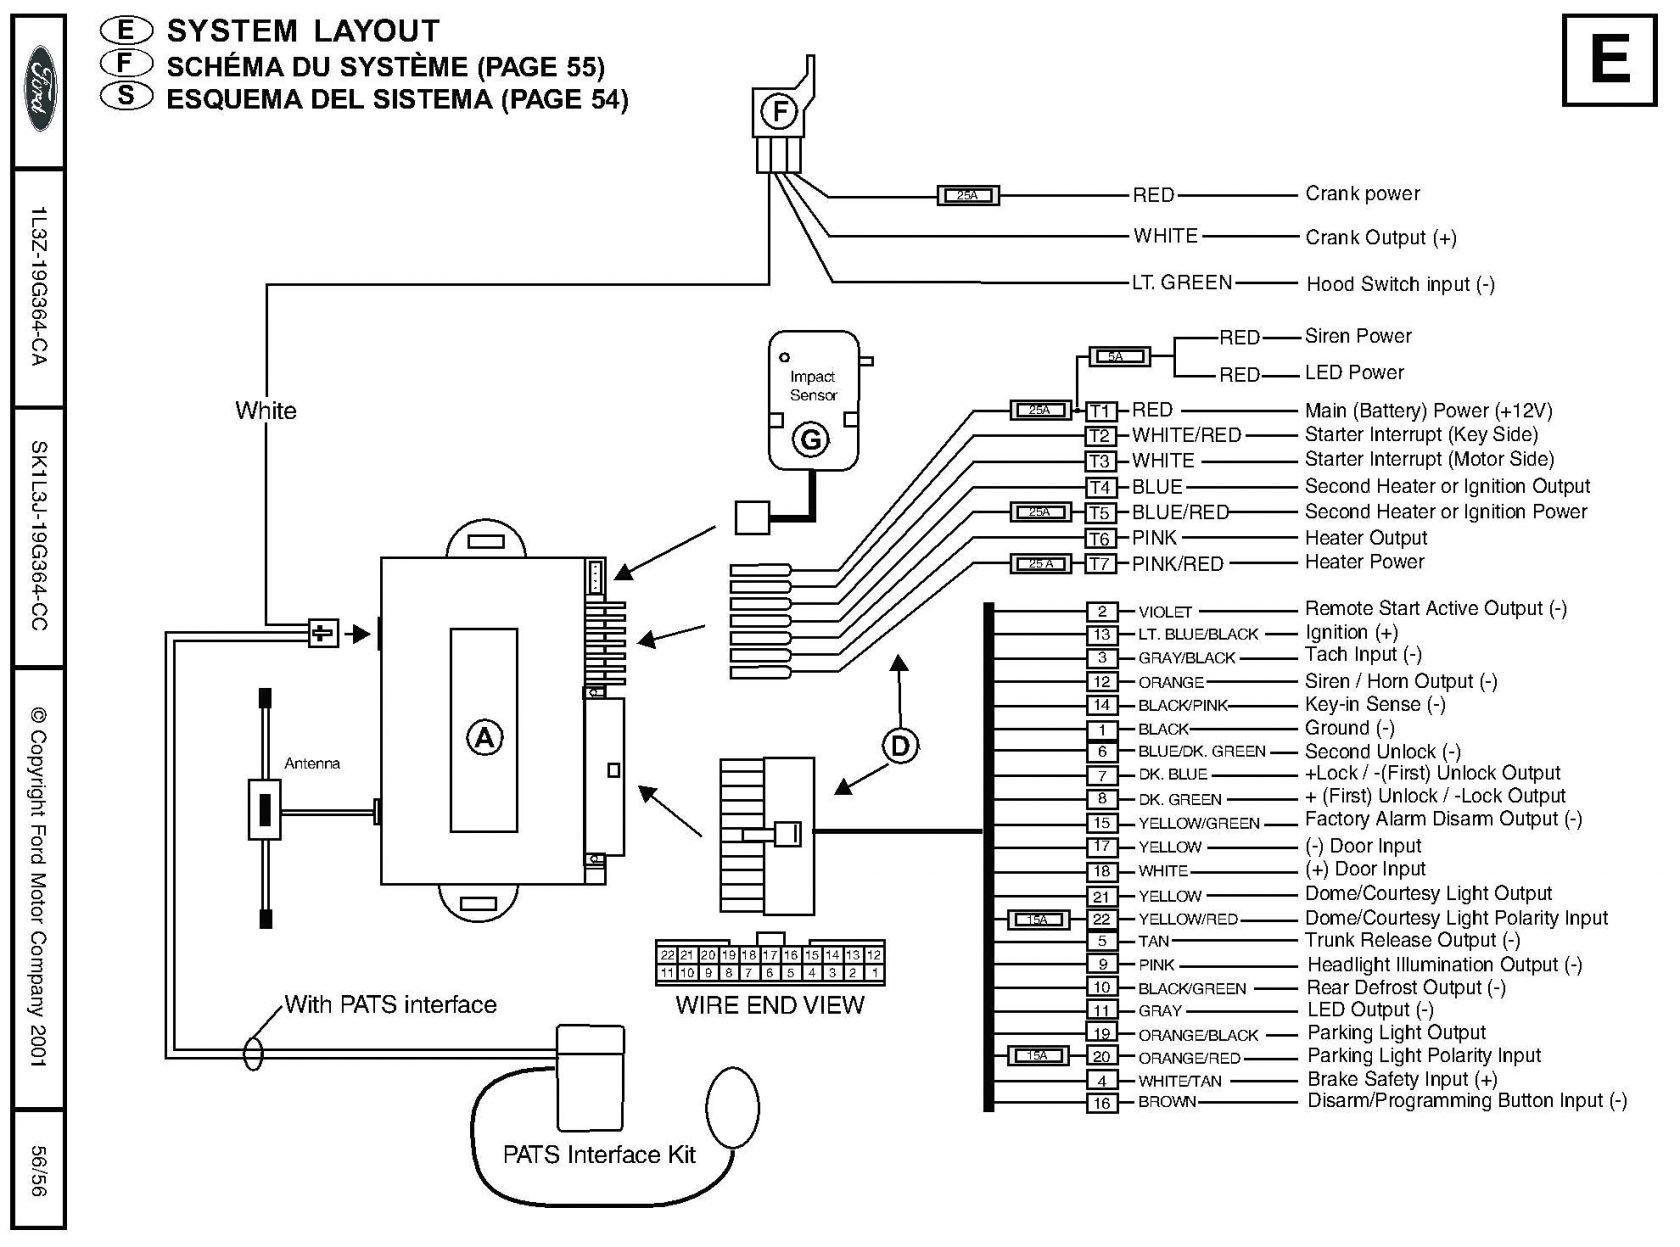 Steelmate Car Alarm Wiring Diagram Karr Car Alarm Wiring Diagram Wiring Diagram Options Of Steelmate Car Alarm Wiring Diagram